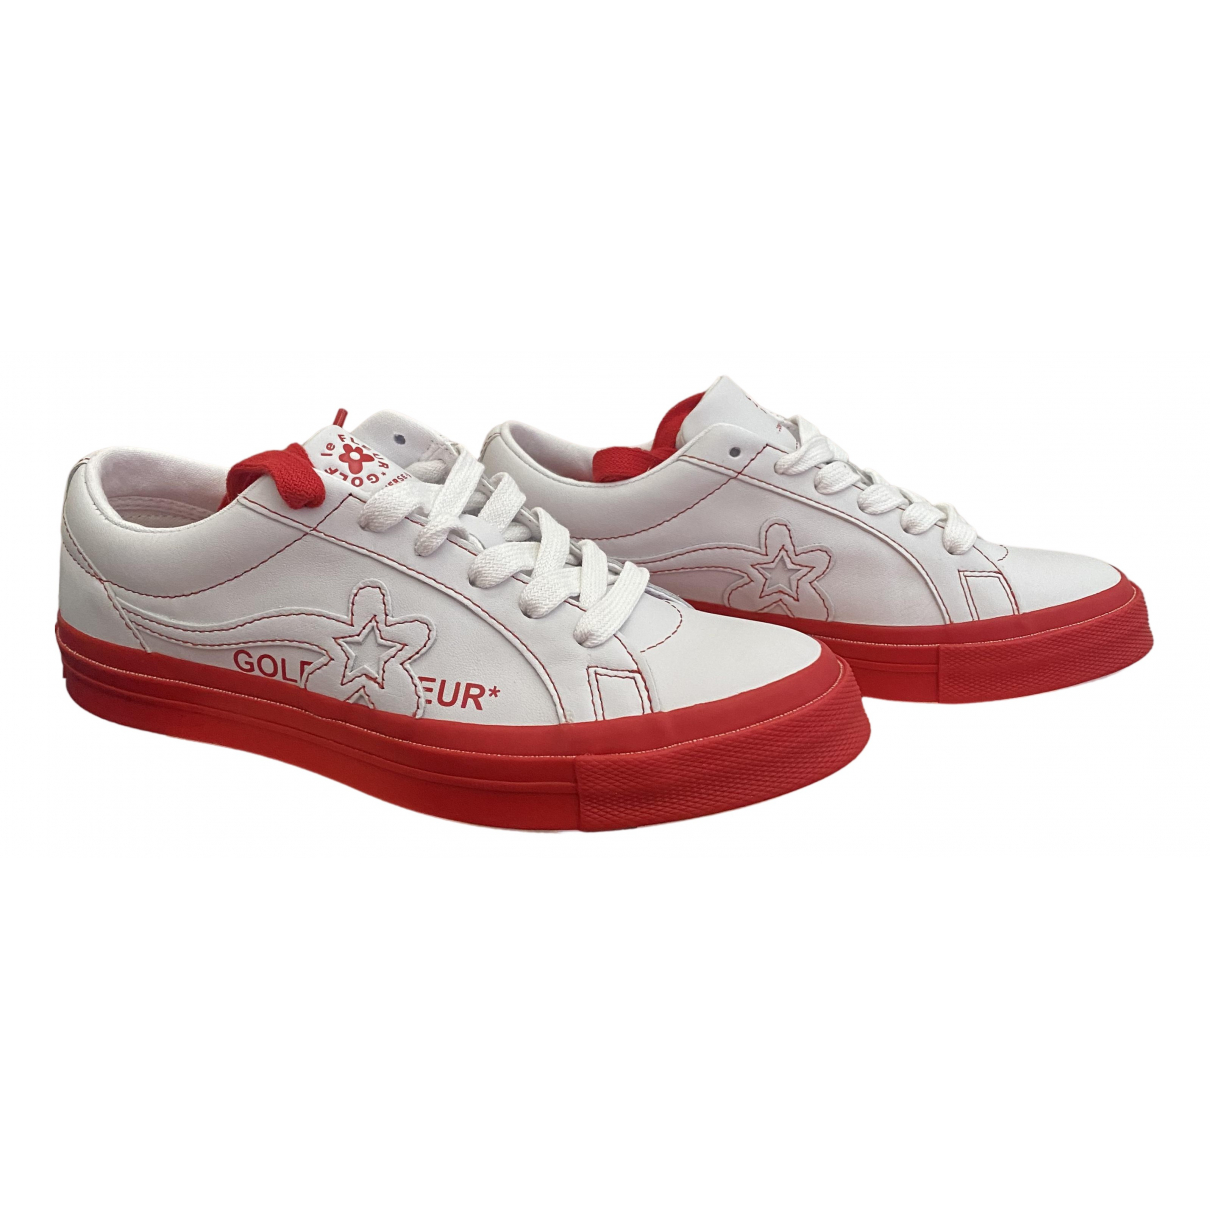 Converse X Golf Le Fleur \N Sneakers in  Rot Leinen